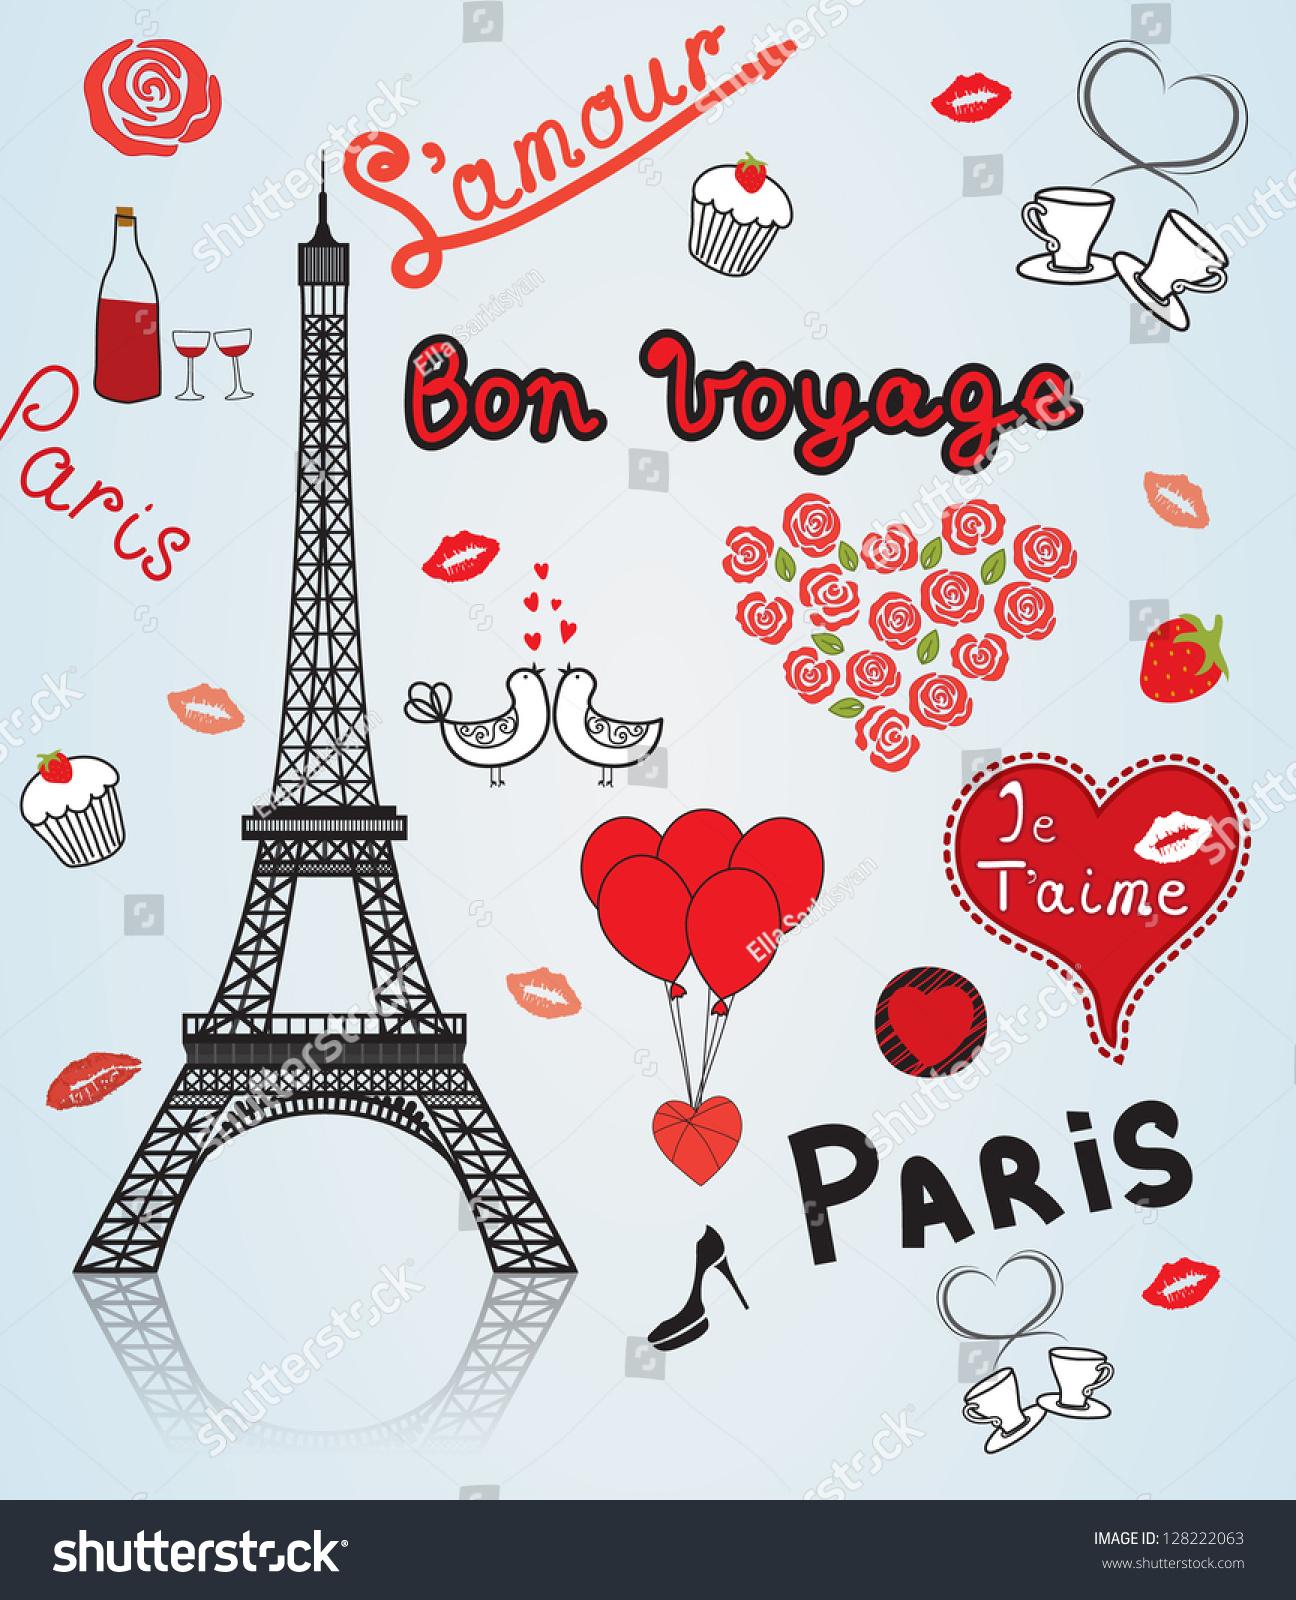 paris city of love stock vector illustration 128222063 shutterstock. Black Bedroom Furniture Sets. Home Design Ideas